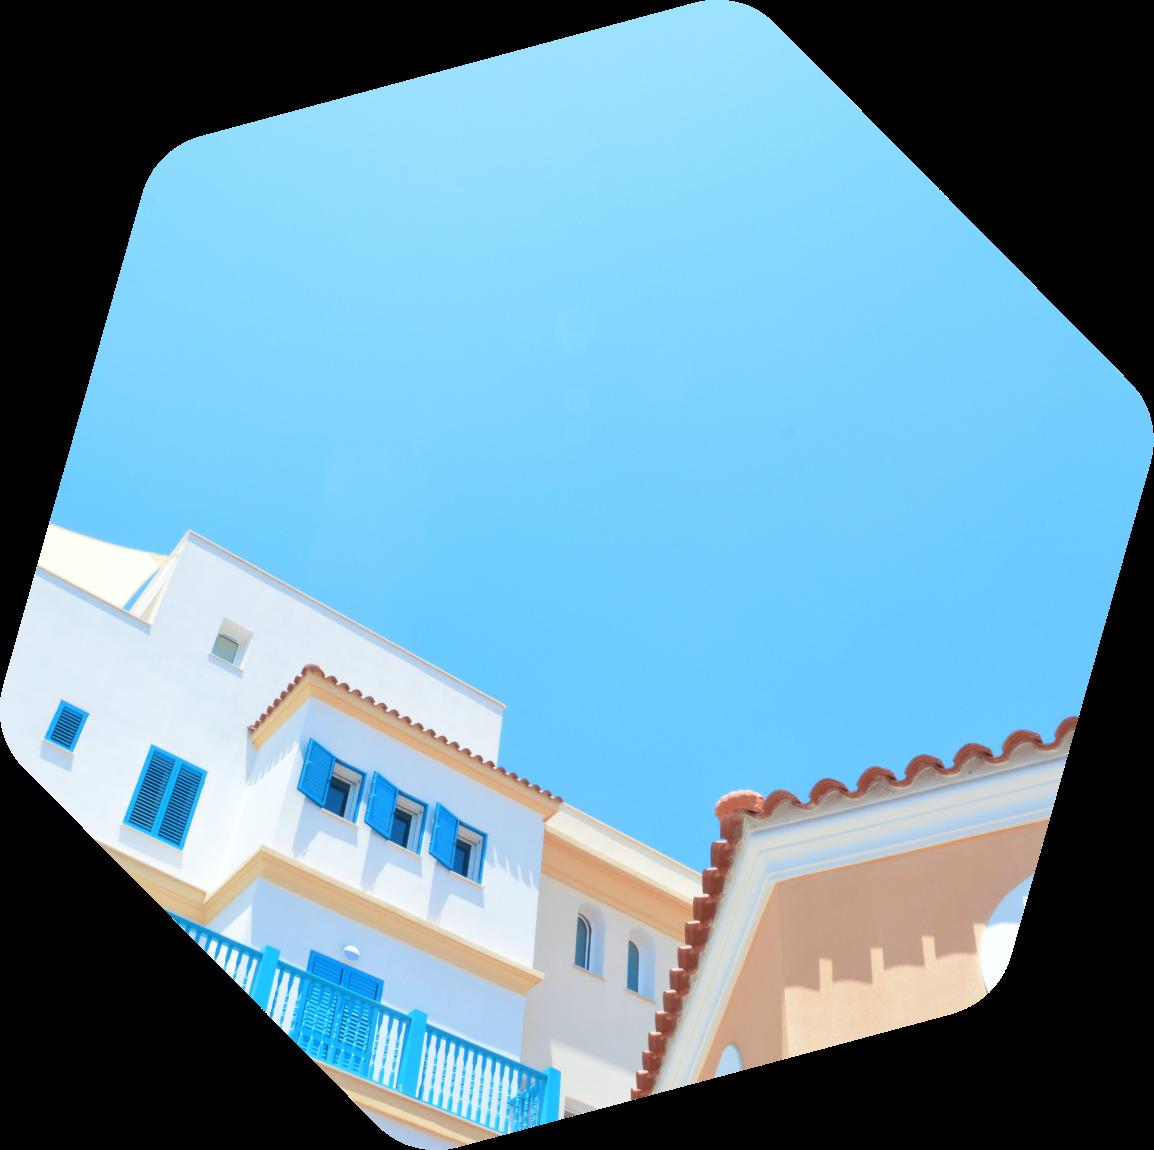 Cyprus sky and buildings